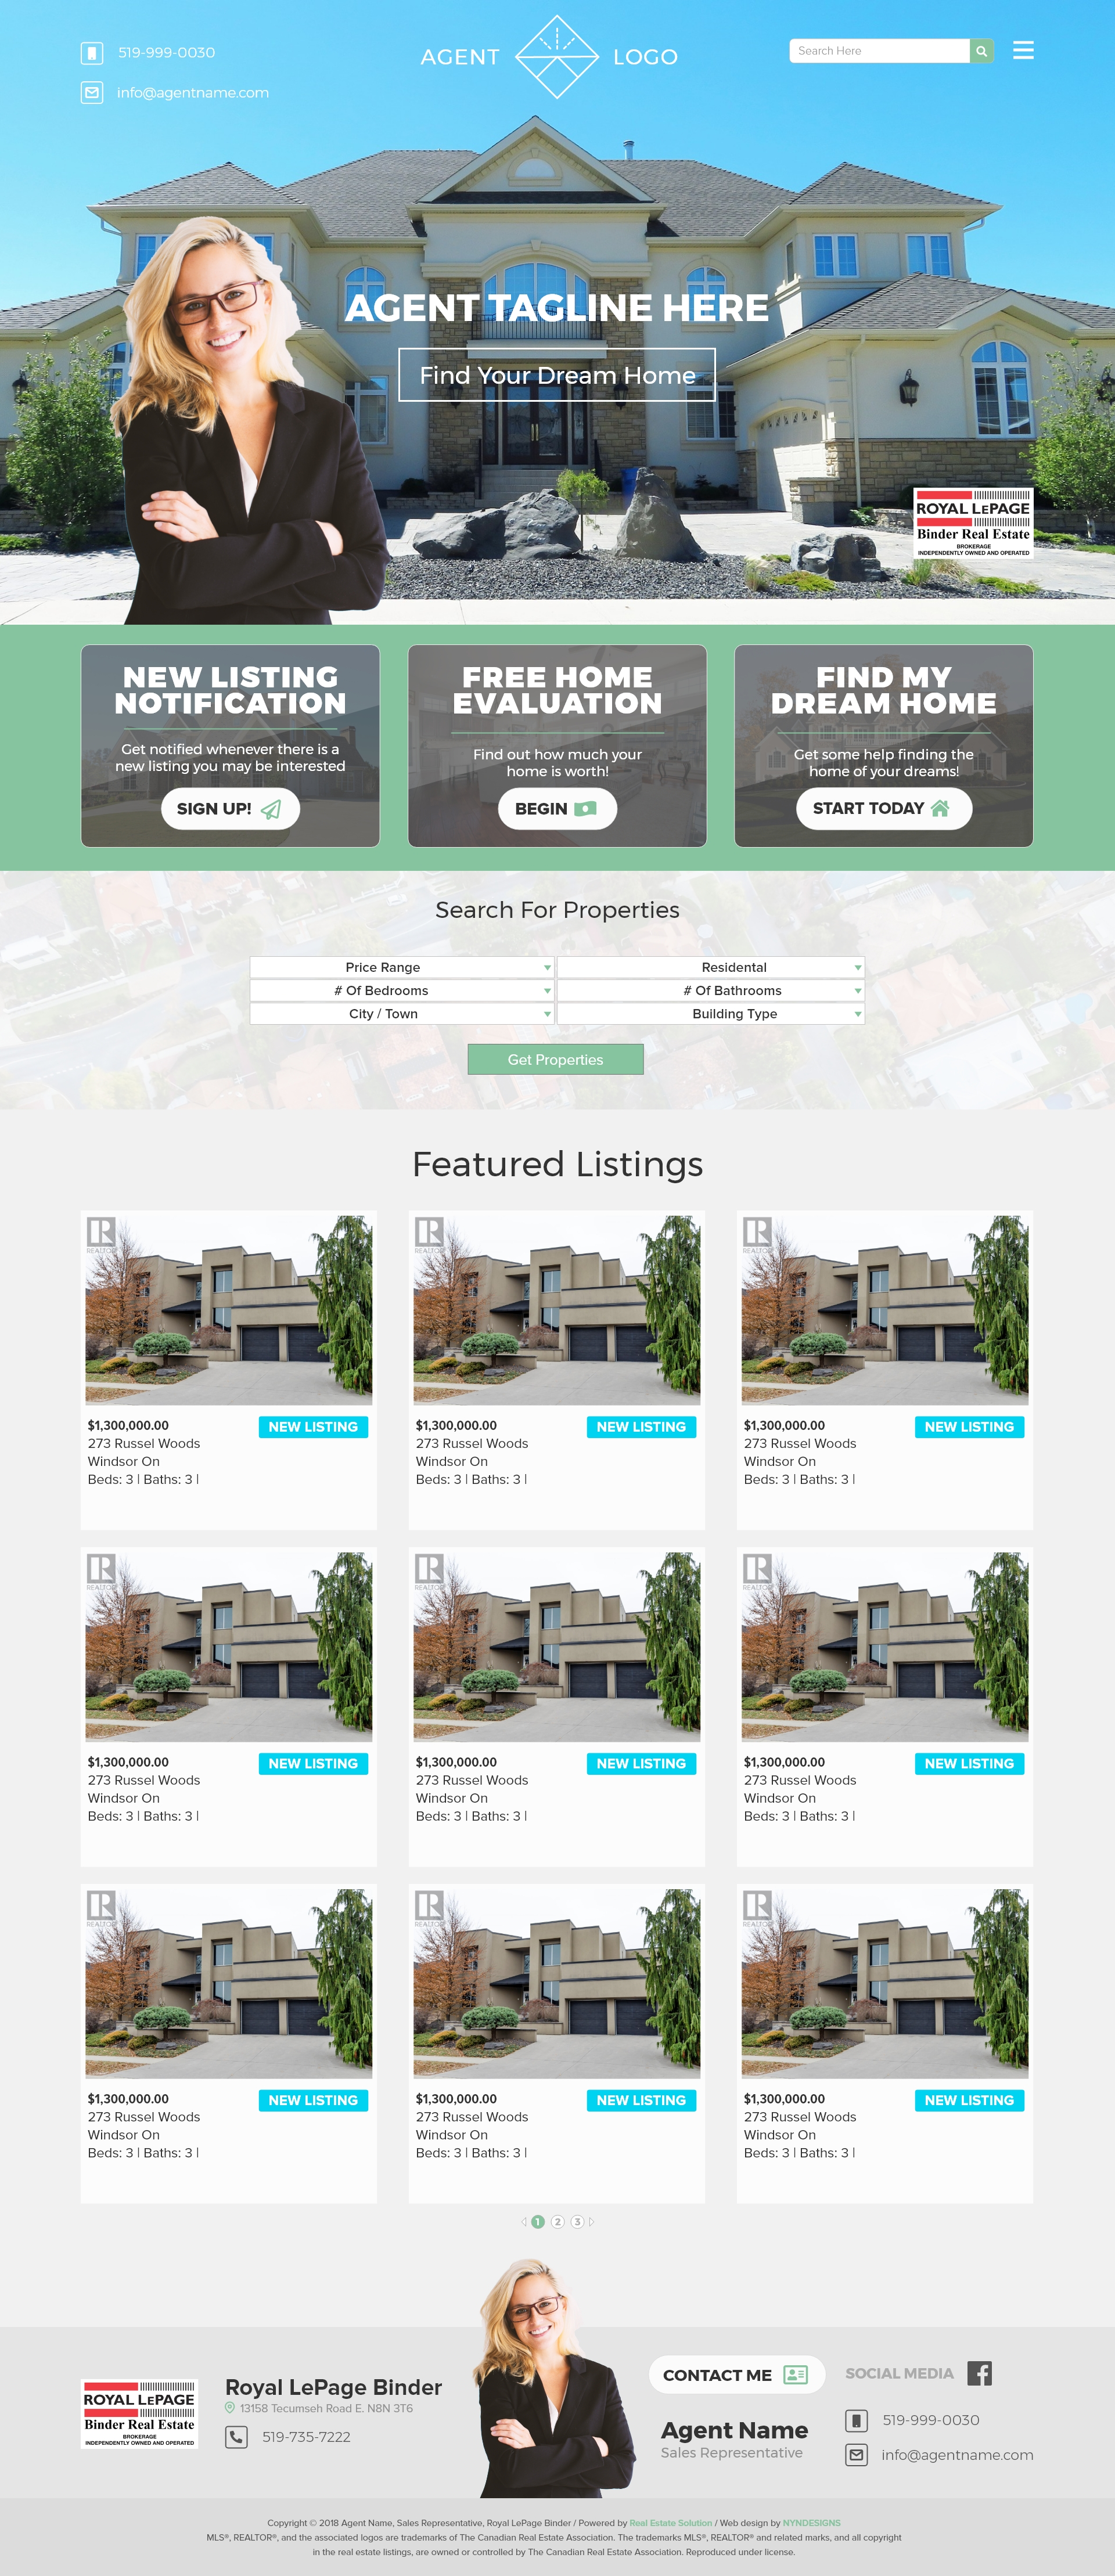 Personalized Professional Websites for REALTORS® | Websites